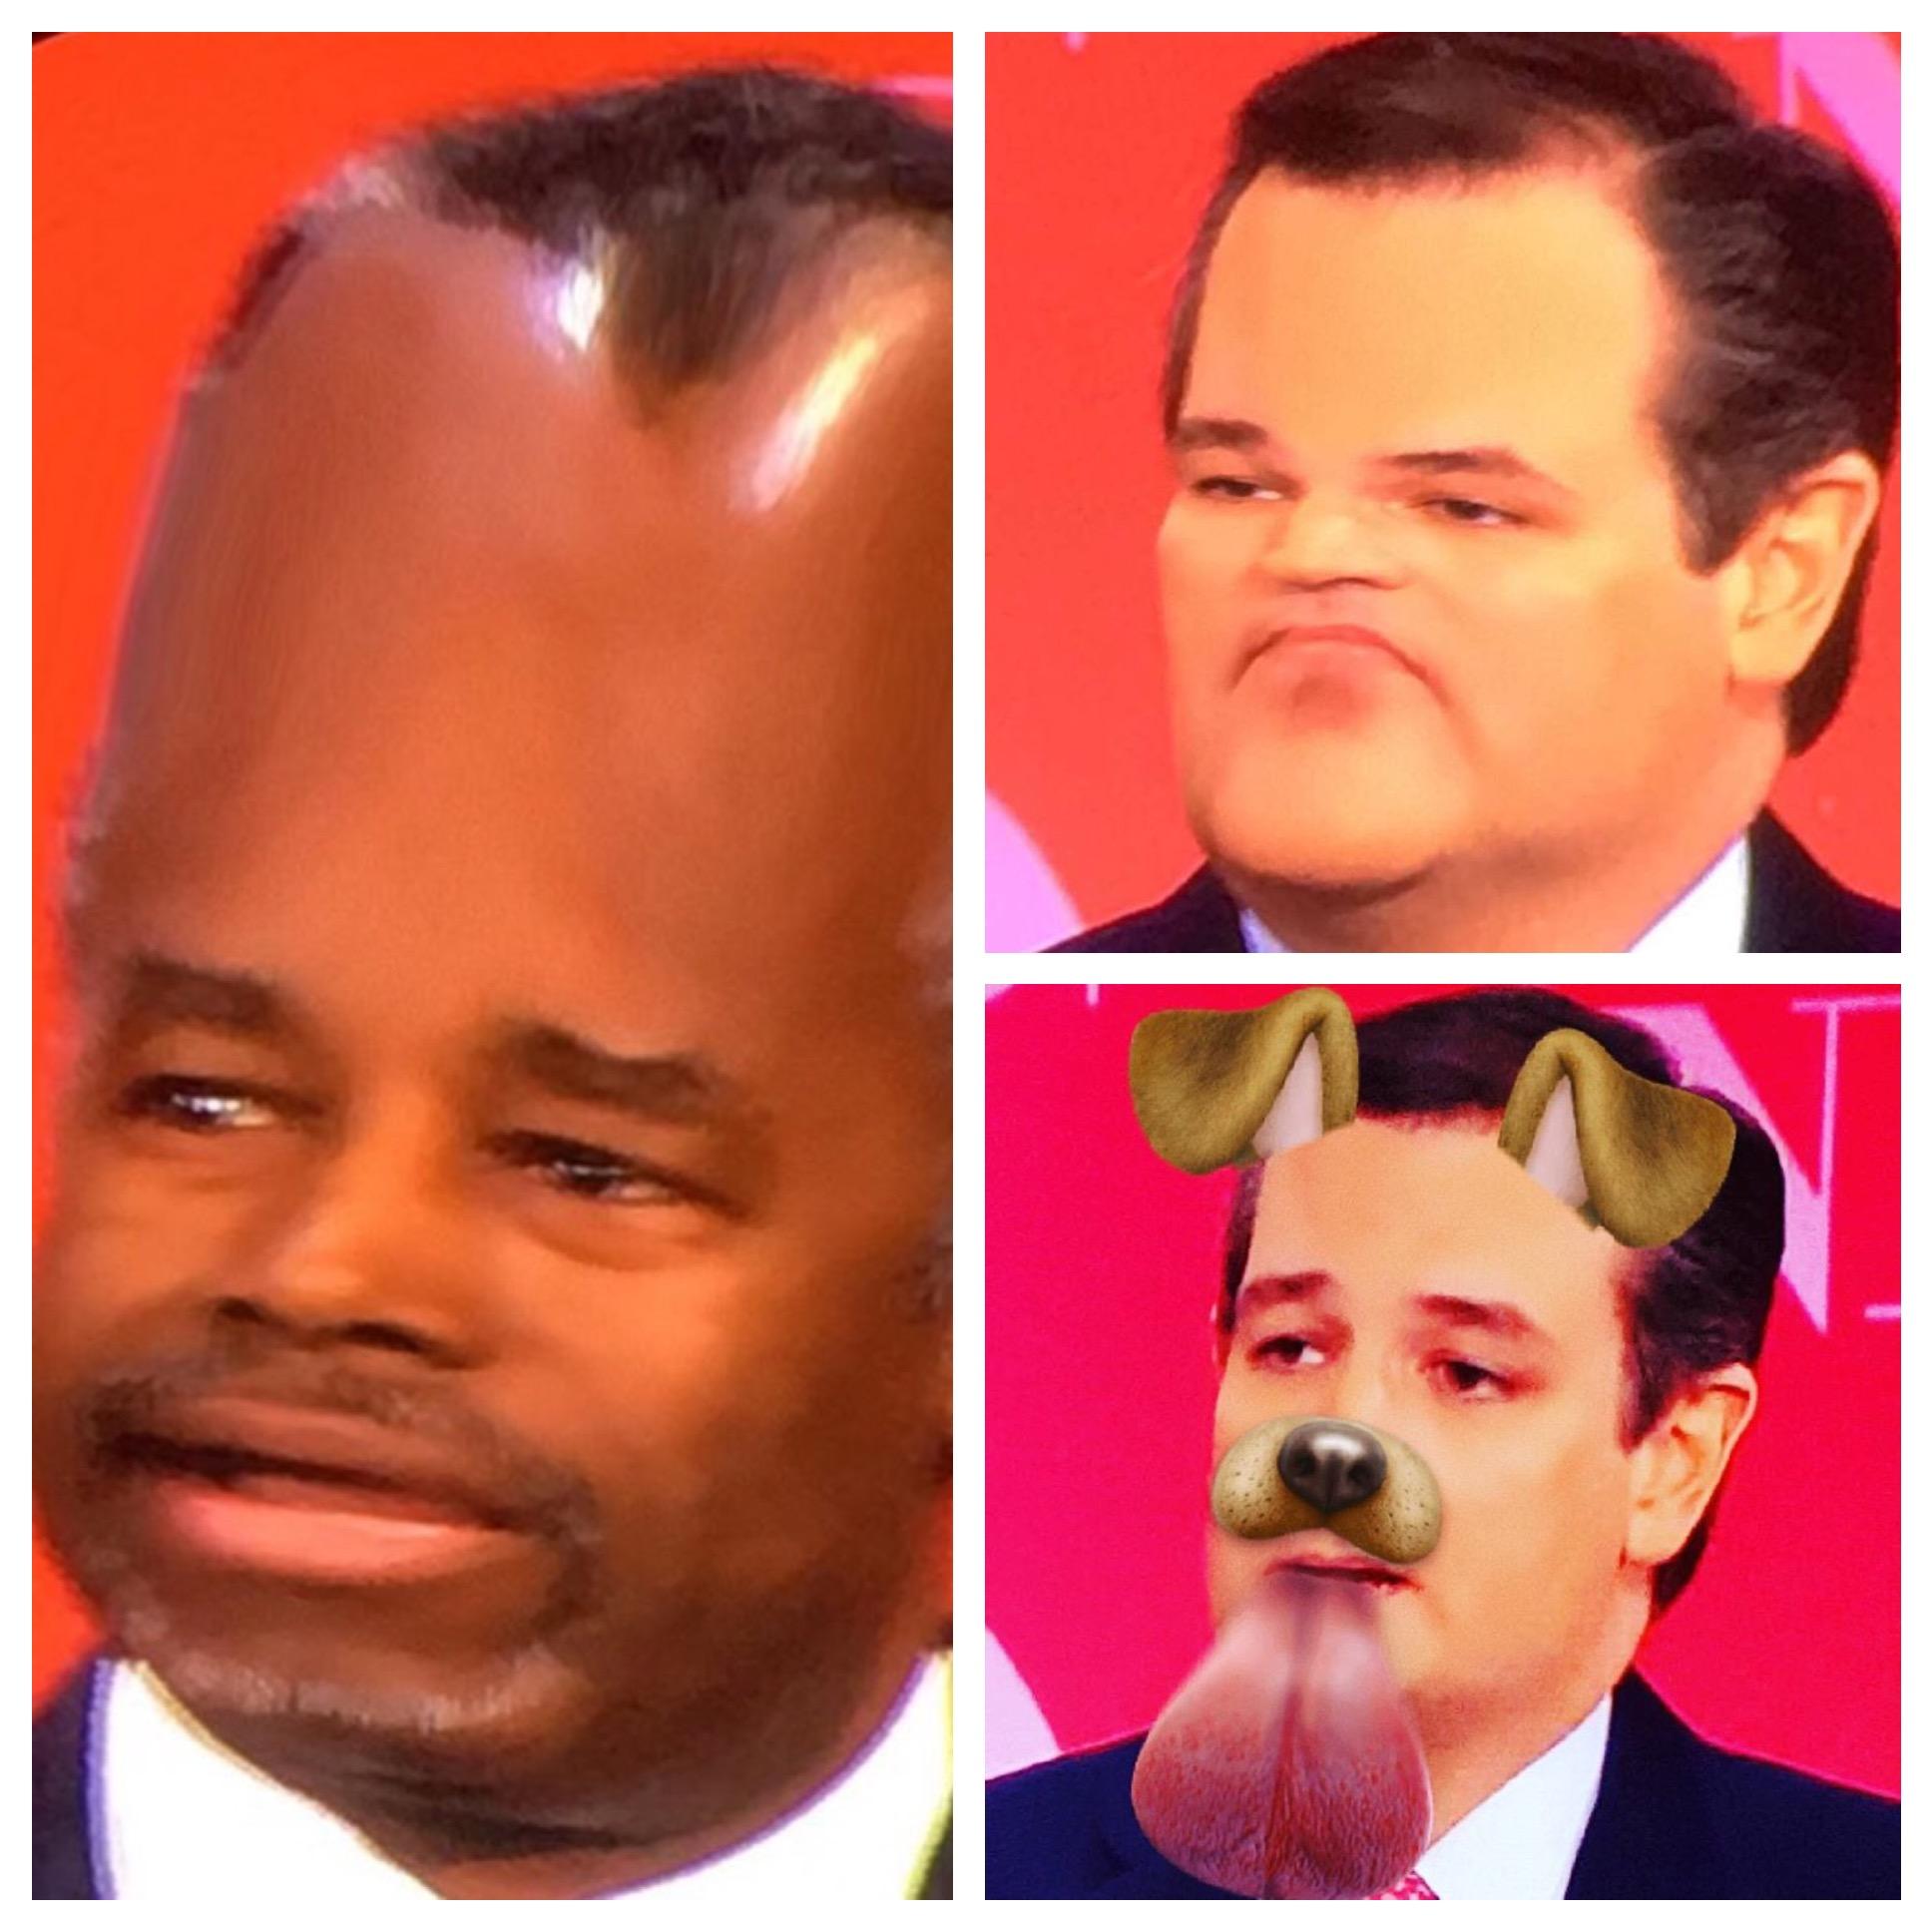 GOP Debate Snapchat